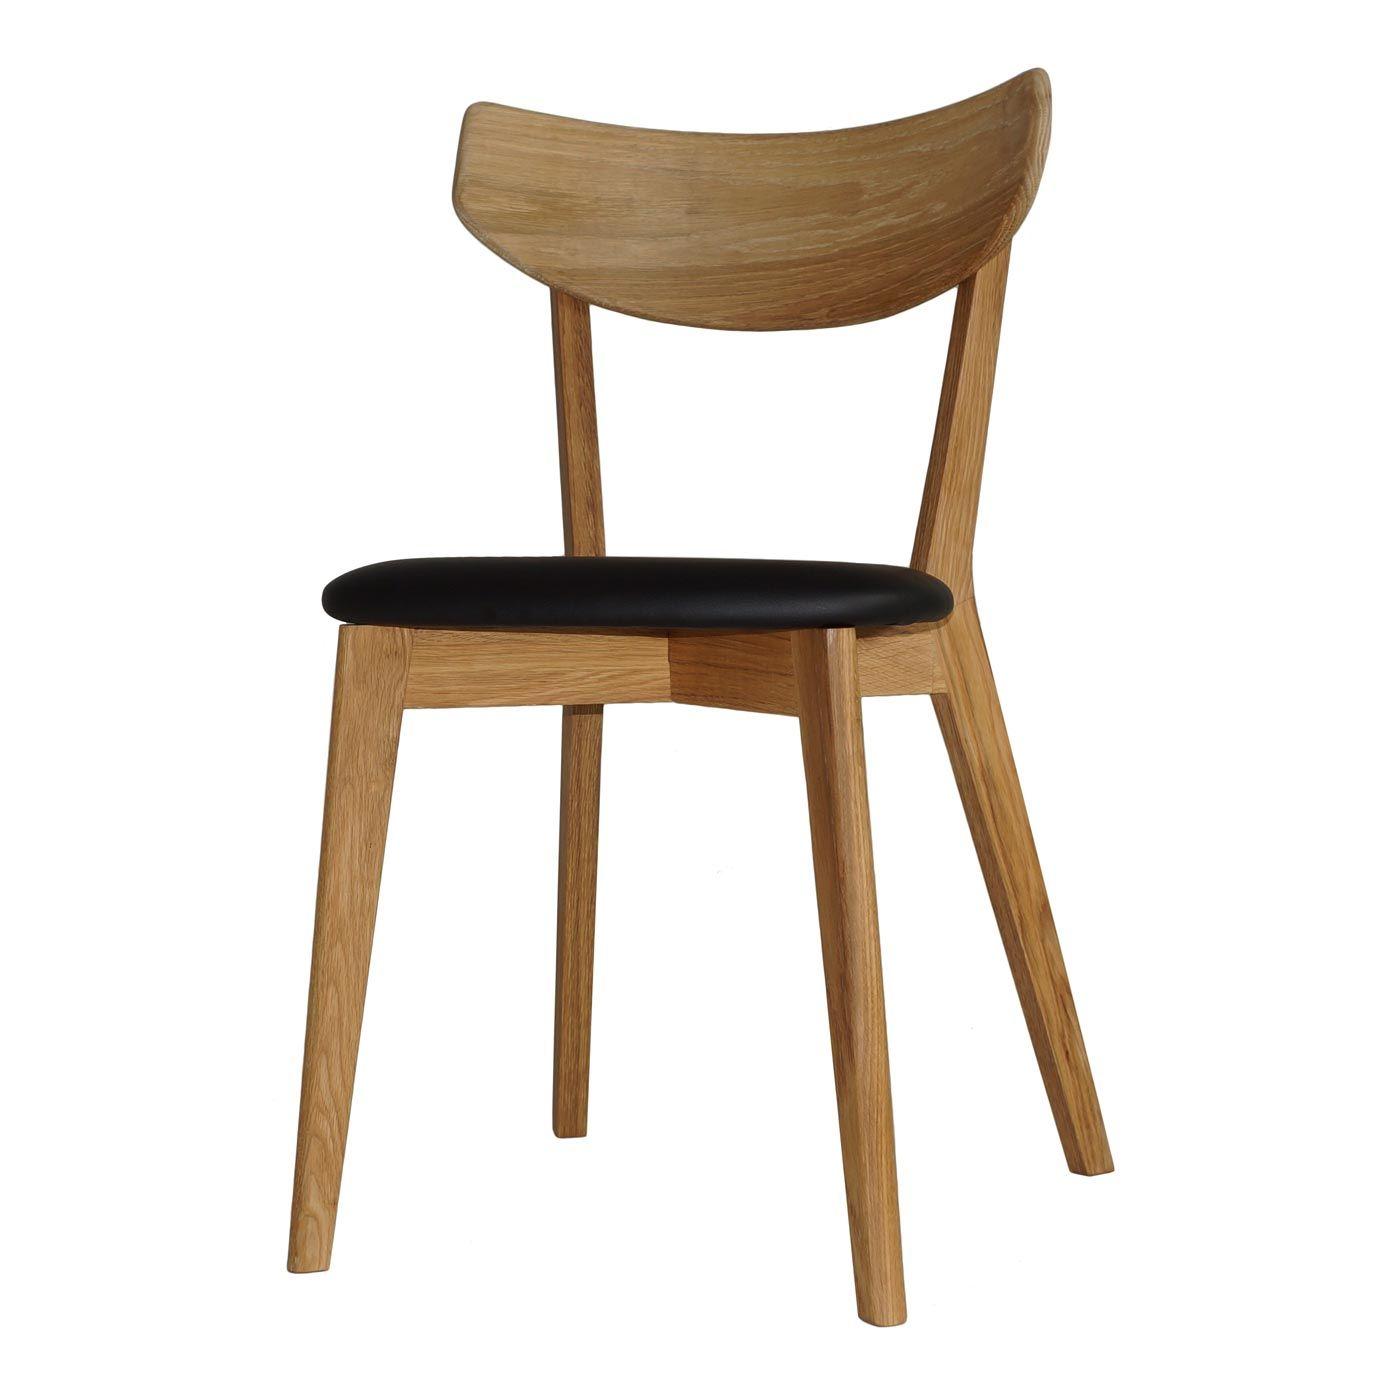 Eiken Eetkamer Stoel.Nordiq Ami Chair Houten Eetkamerstoel Zwarte Bekleding Vintage